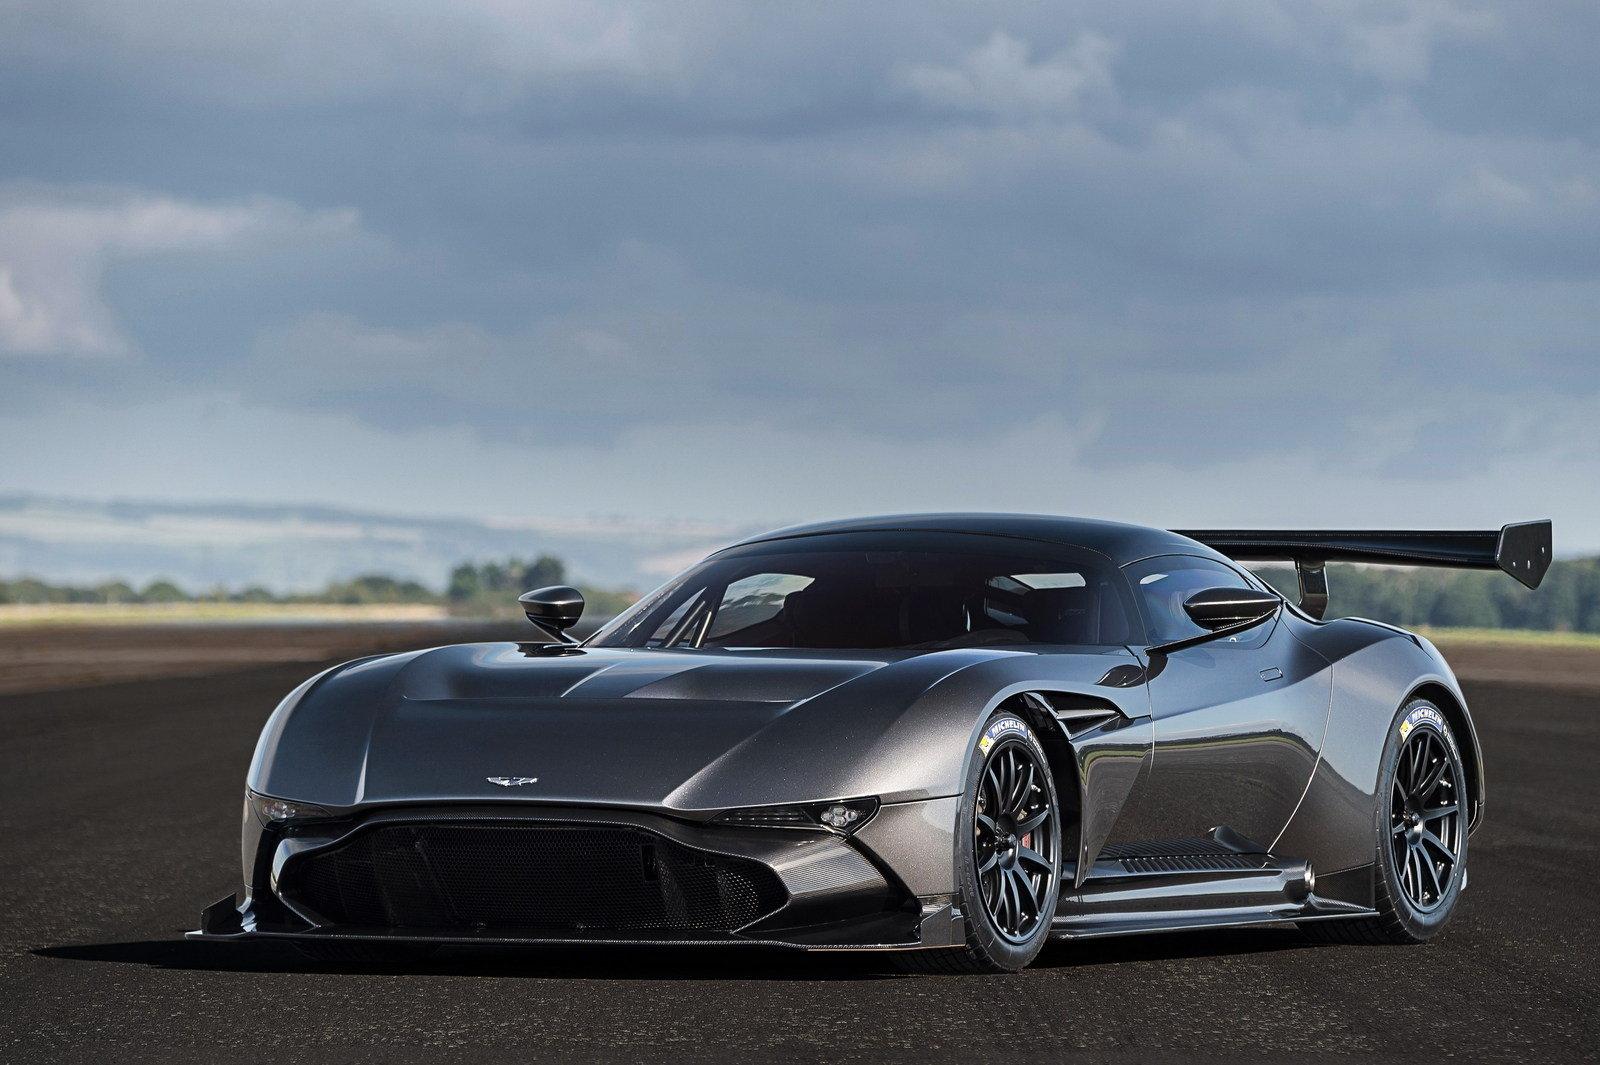 Aston Martin Vulcan branding